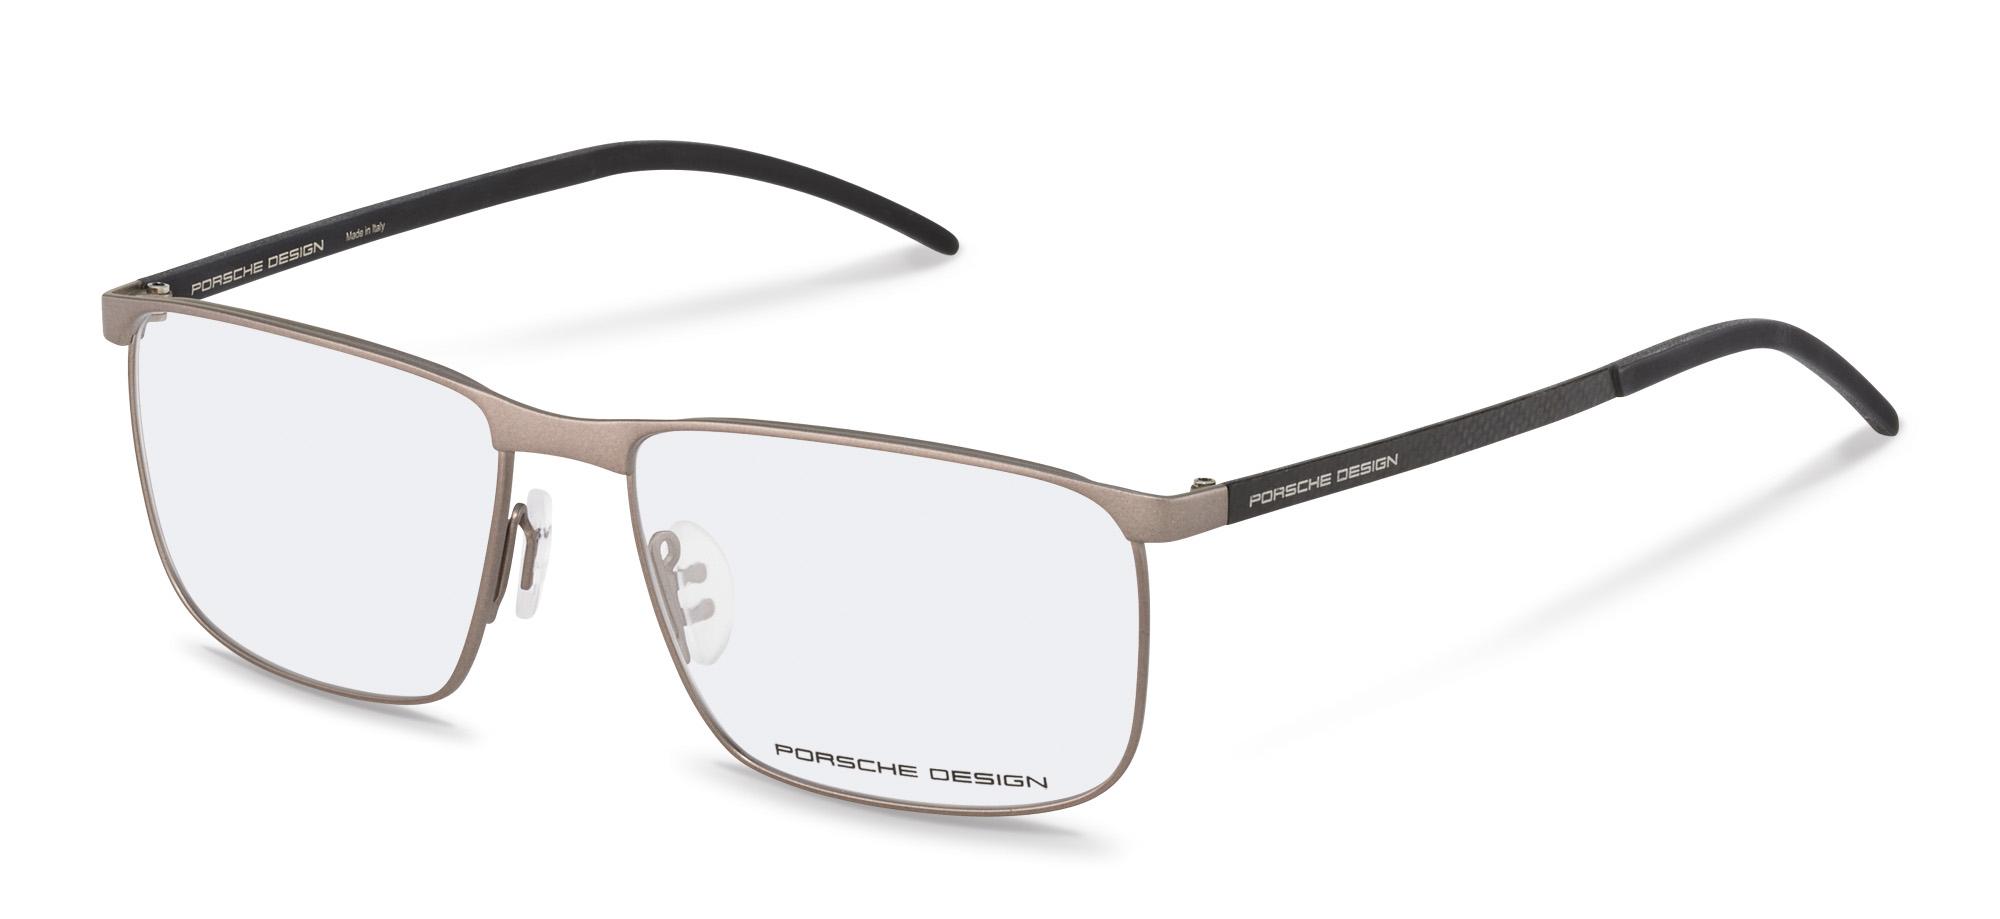 2da46f94b5f8 Porsche Design-Ophthalmic frame-P8339-black